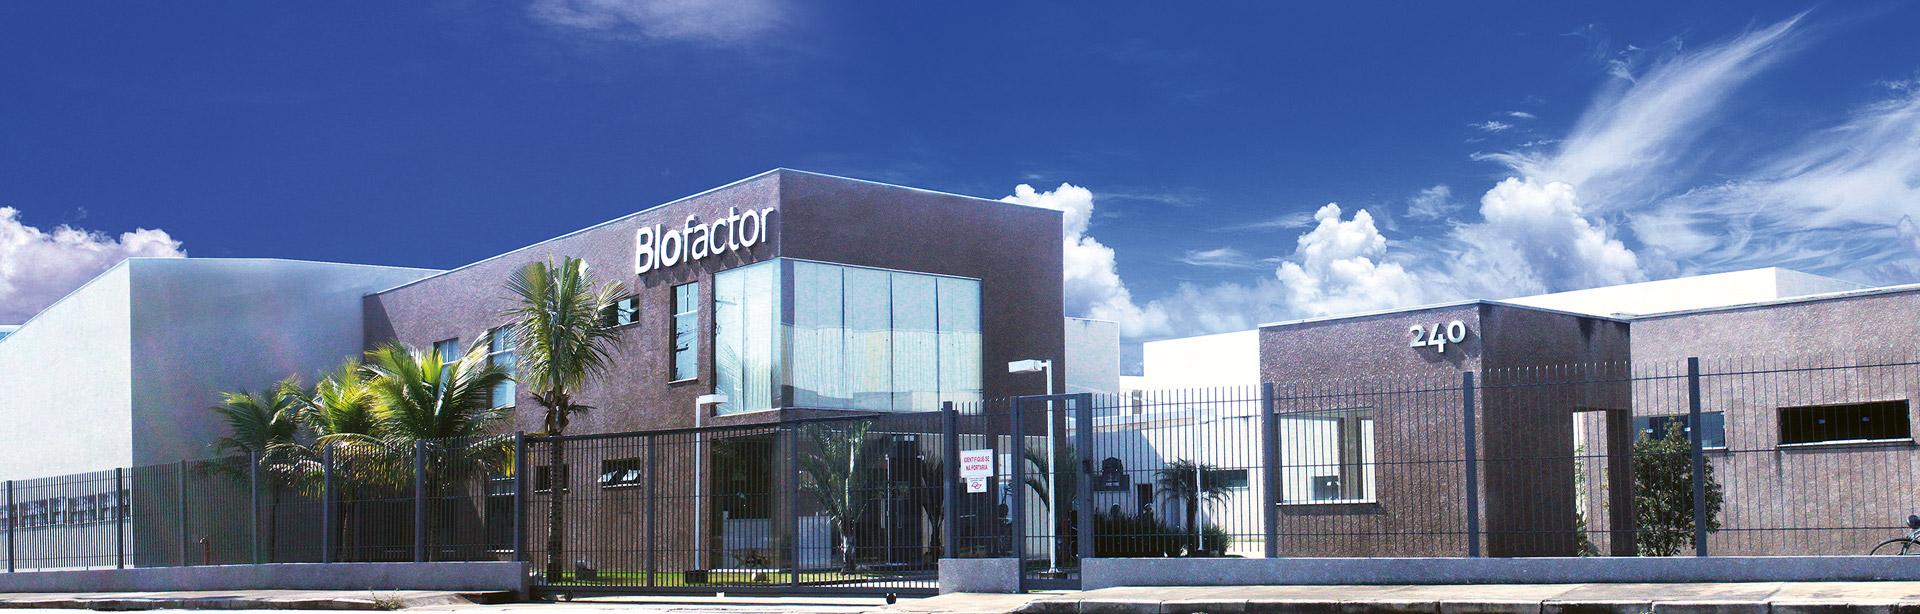 biofactor-terceirizacao-cosmeticos-industria-empresa